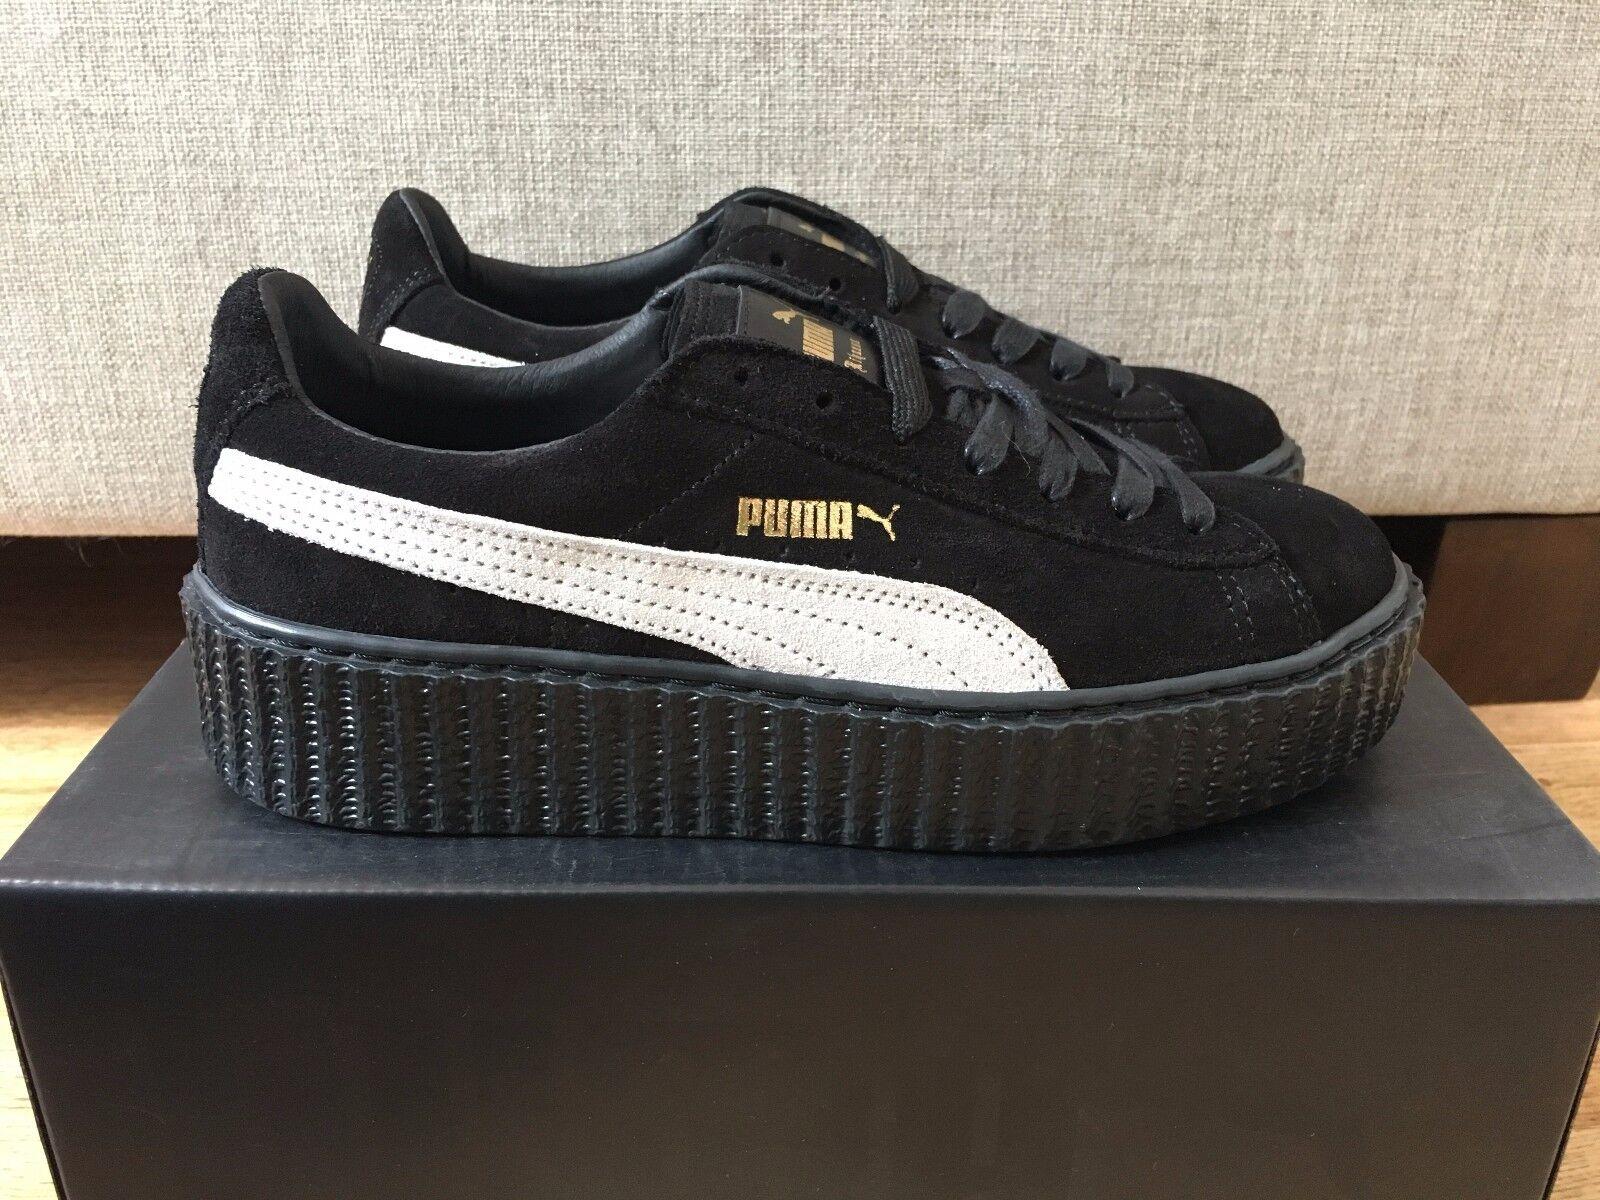 Puma X Rihanna Fenty Creepers Suede Black and and and White UK5 6 EU38 39 4cadf9